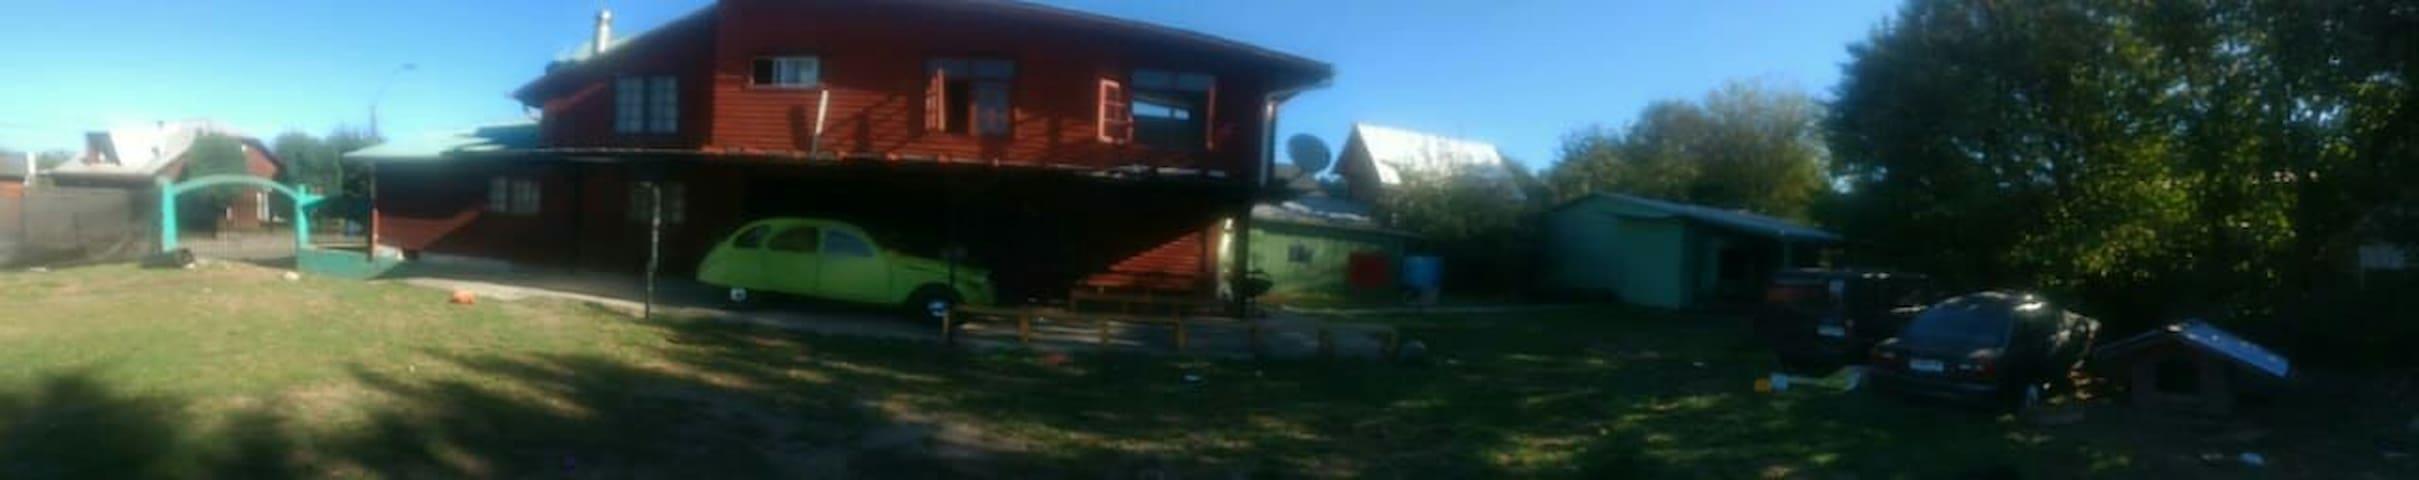 Hospedaje Adan - Villarrica